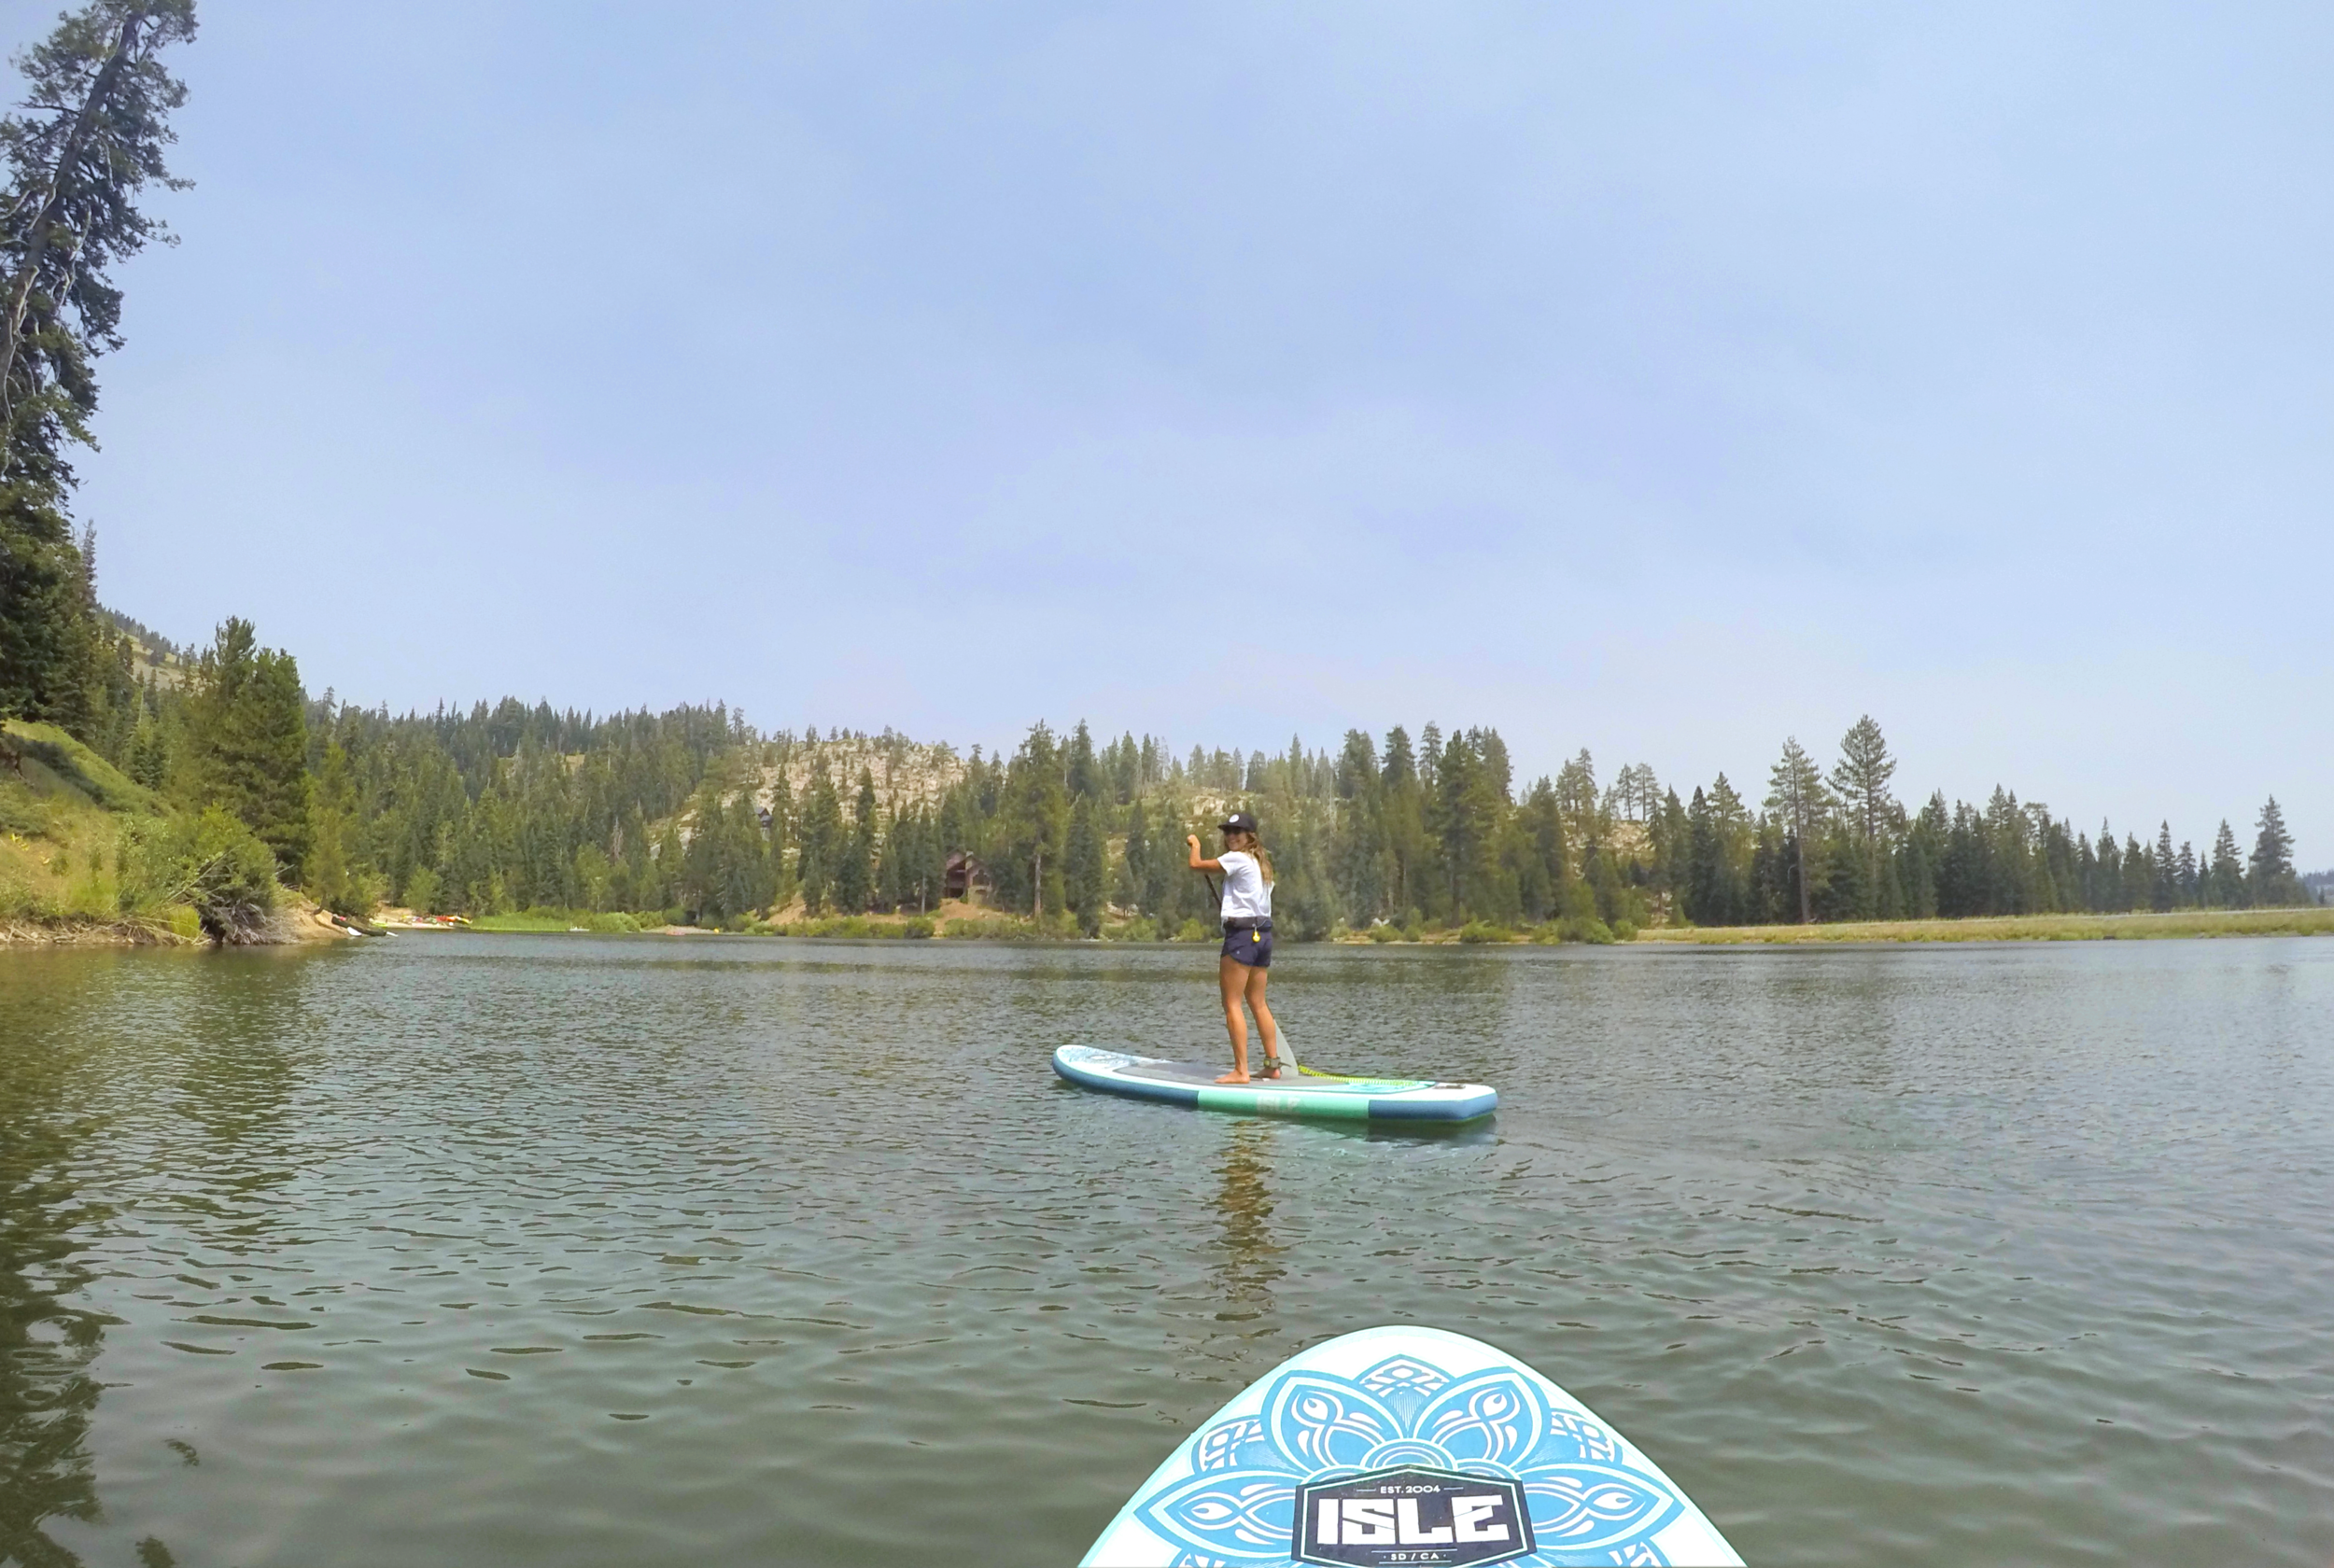 Bear+Valley+Pursuit+Series+Day+2+Jess+Fischer+GoPro.png